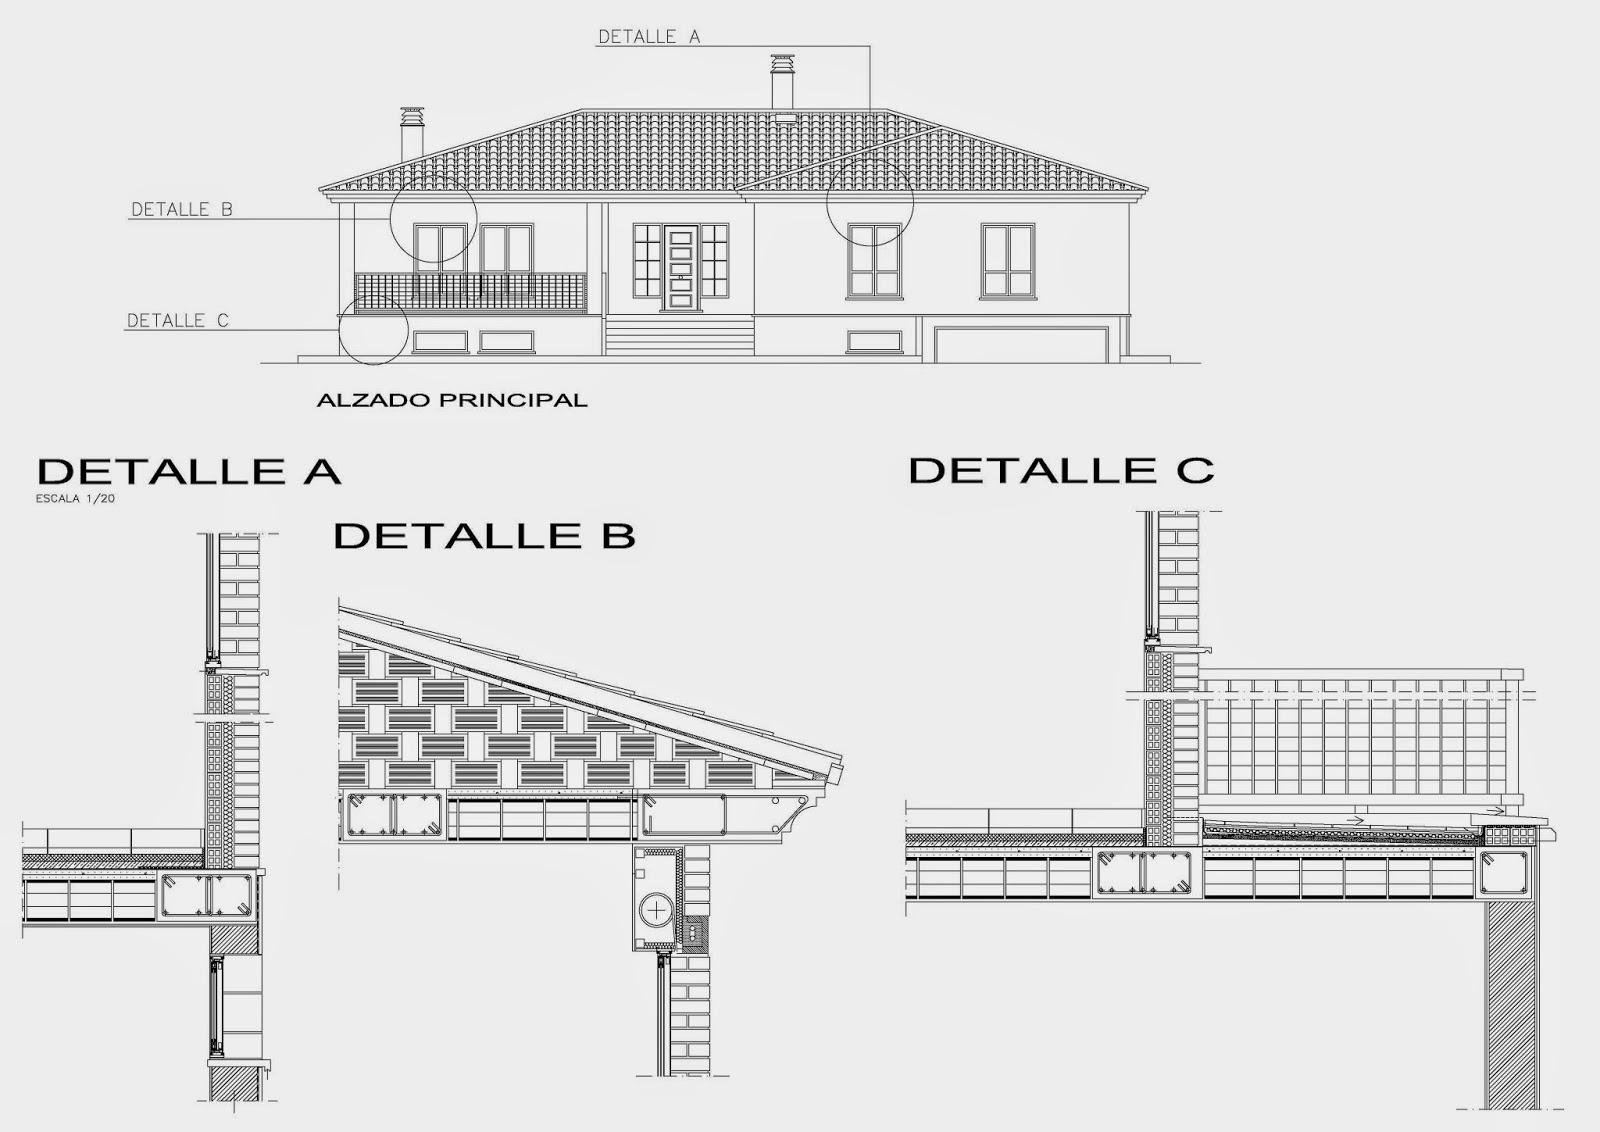 Rc i e s gran v a alicante pr ctica 10 11 12 planos 11 for Fachadas en planos arquitectonicos